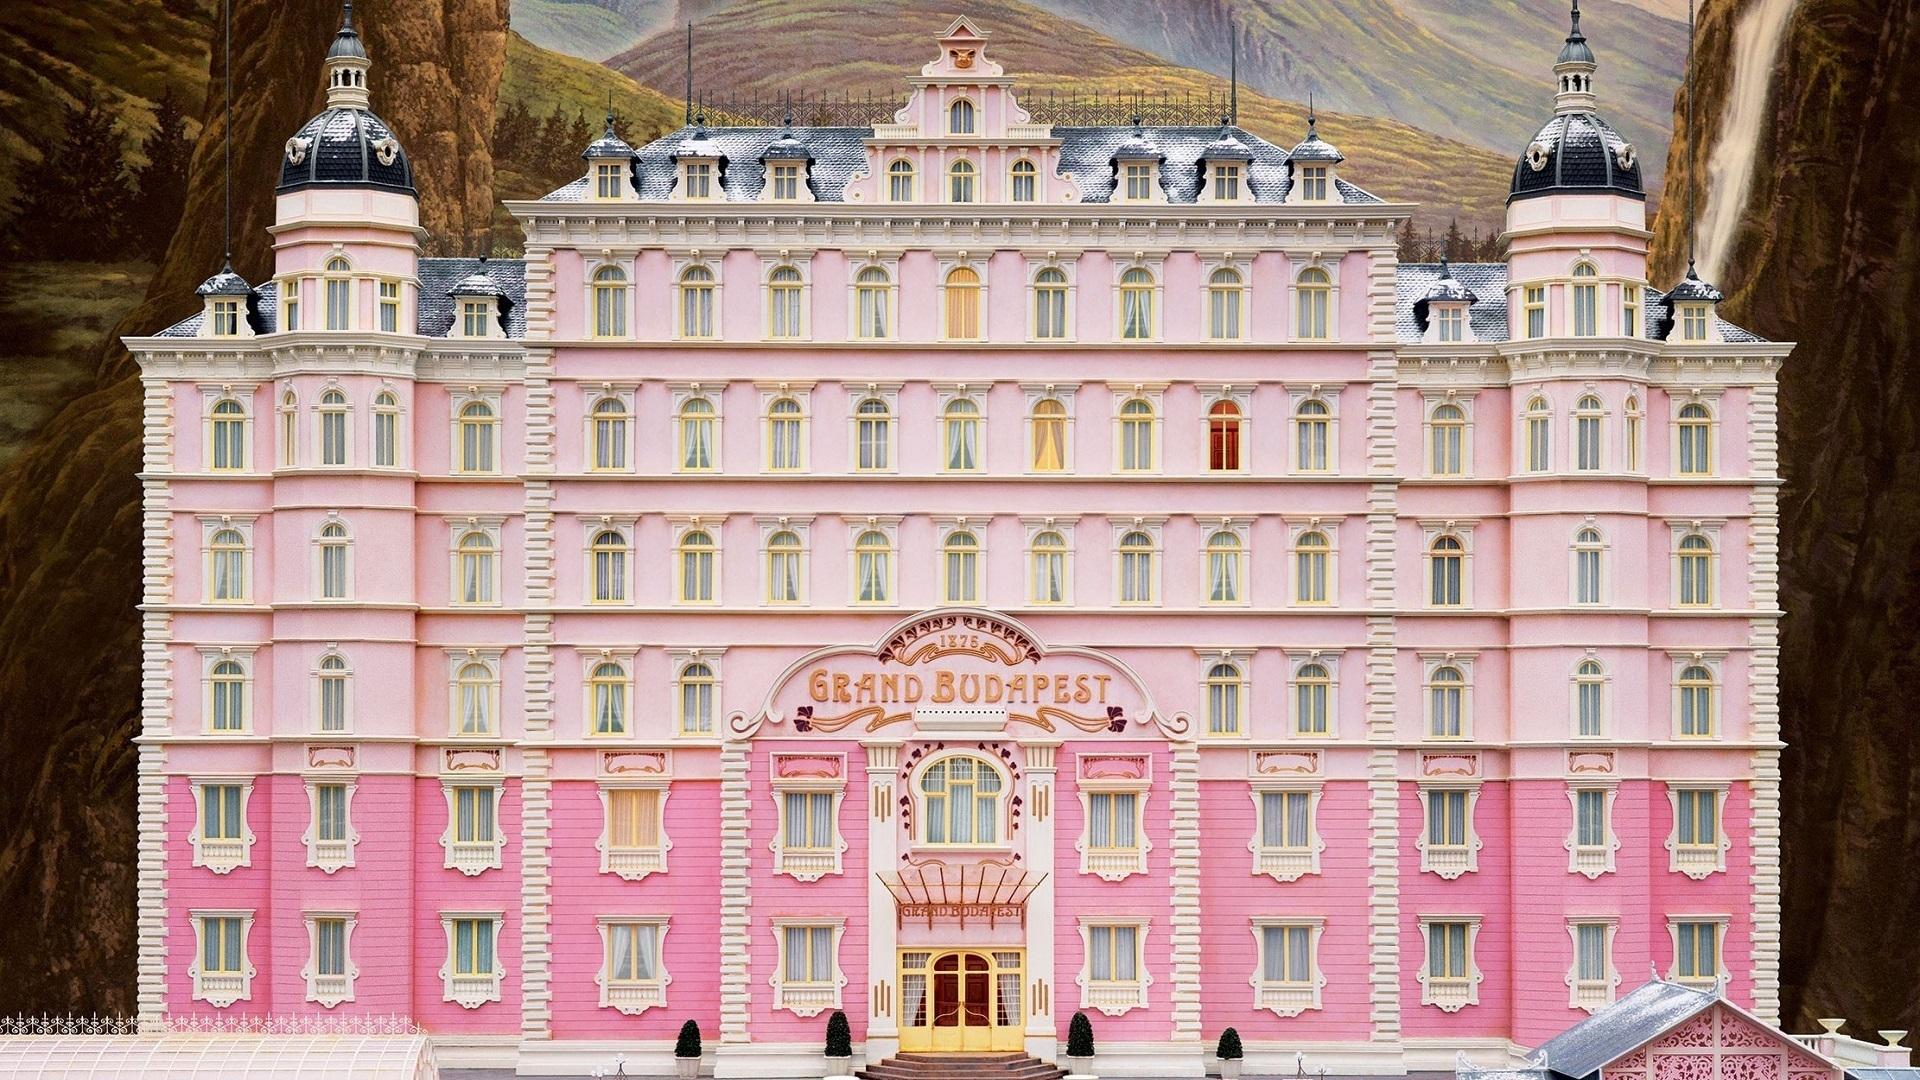 Best 56 The Grand Budapest Hotel Wallpaper on HipWallpaper The 1920x1080